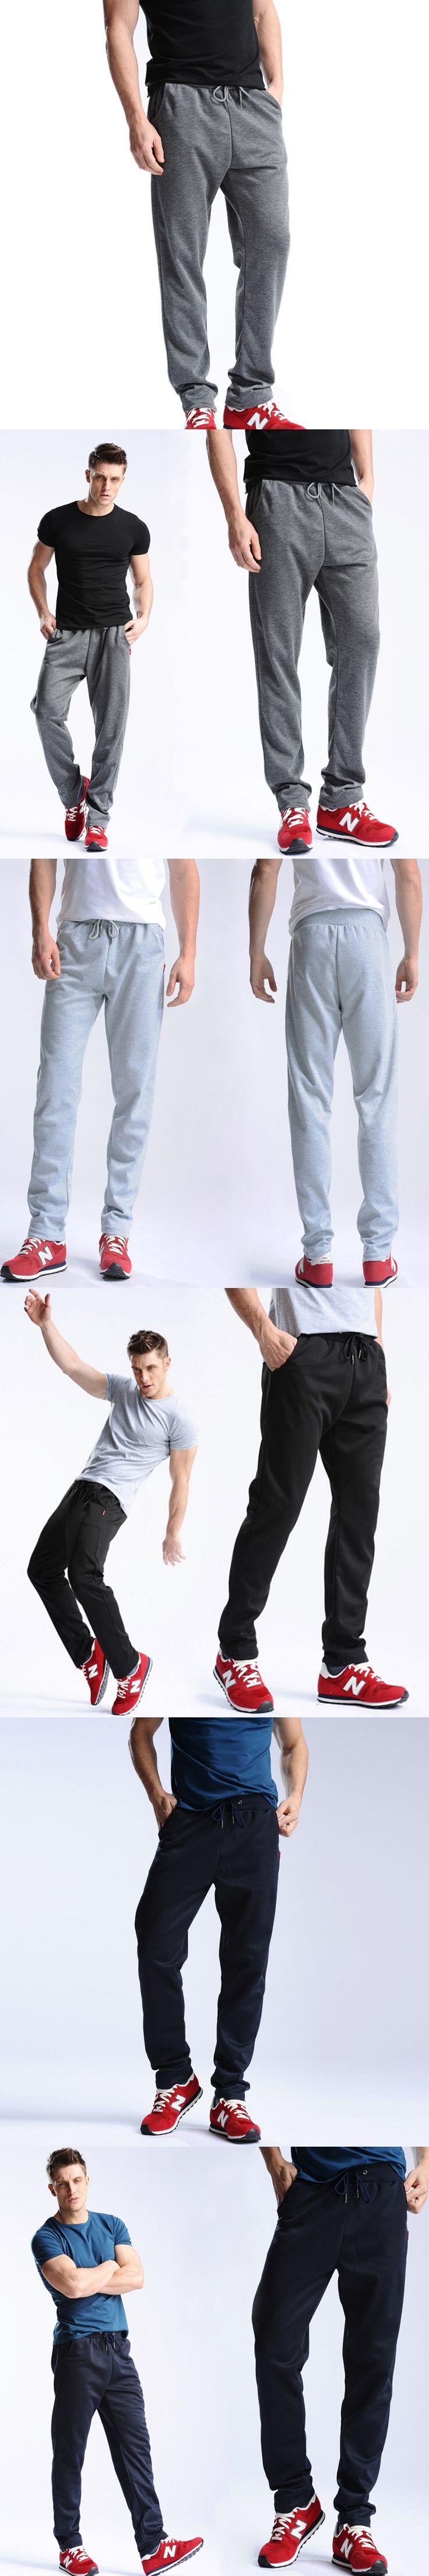 2017 Brand Casual Joggers Solid Business Compression Pants Men Cotton Sweatpants Trousers Calabasas Militar Pants